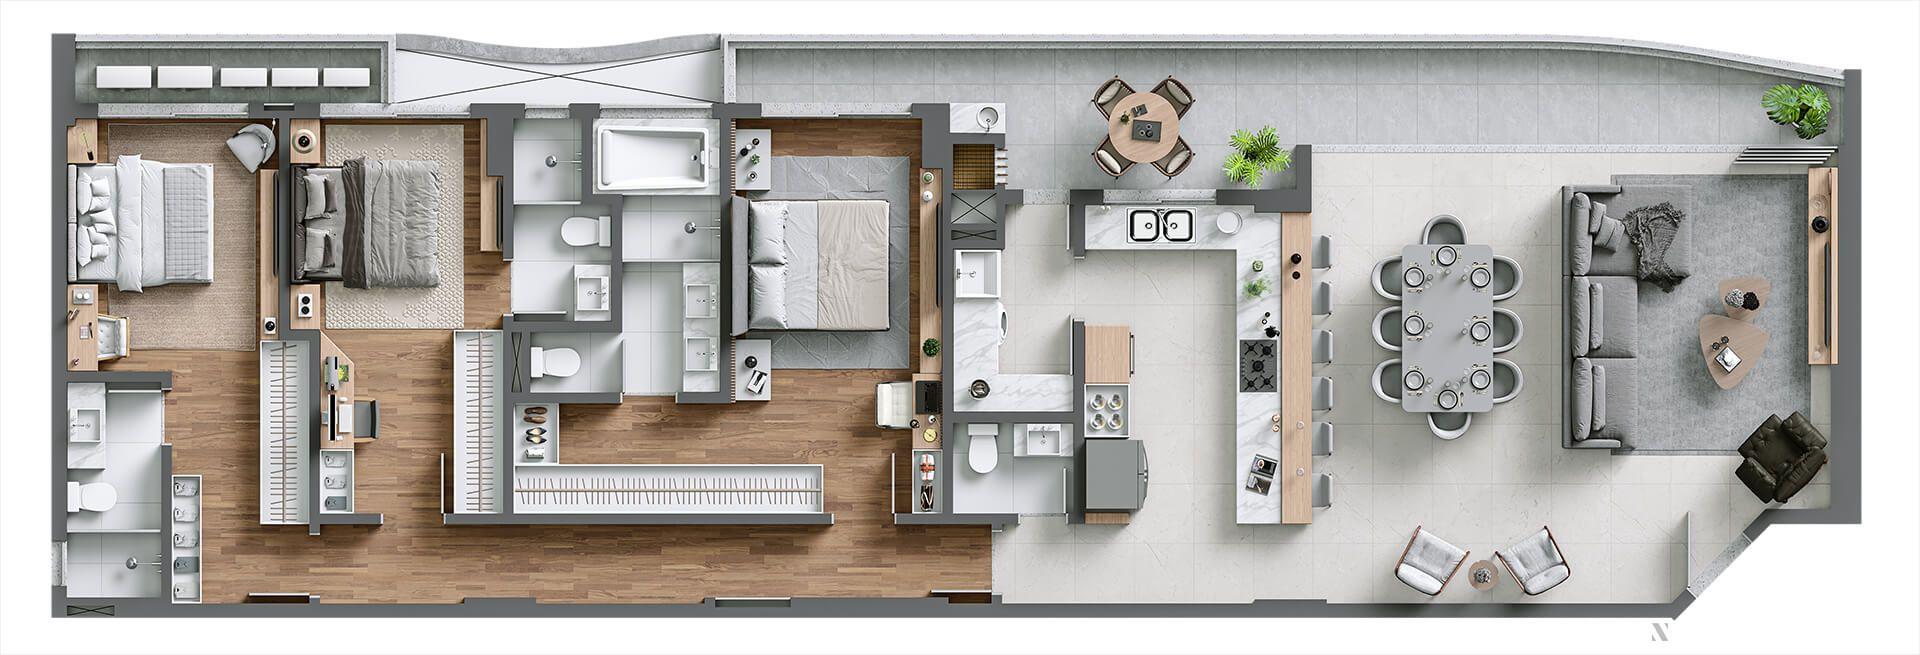 Planta do Le Blanc Brava Residence. floorplan